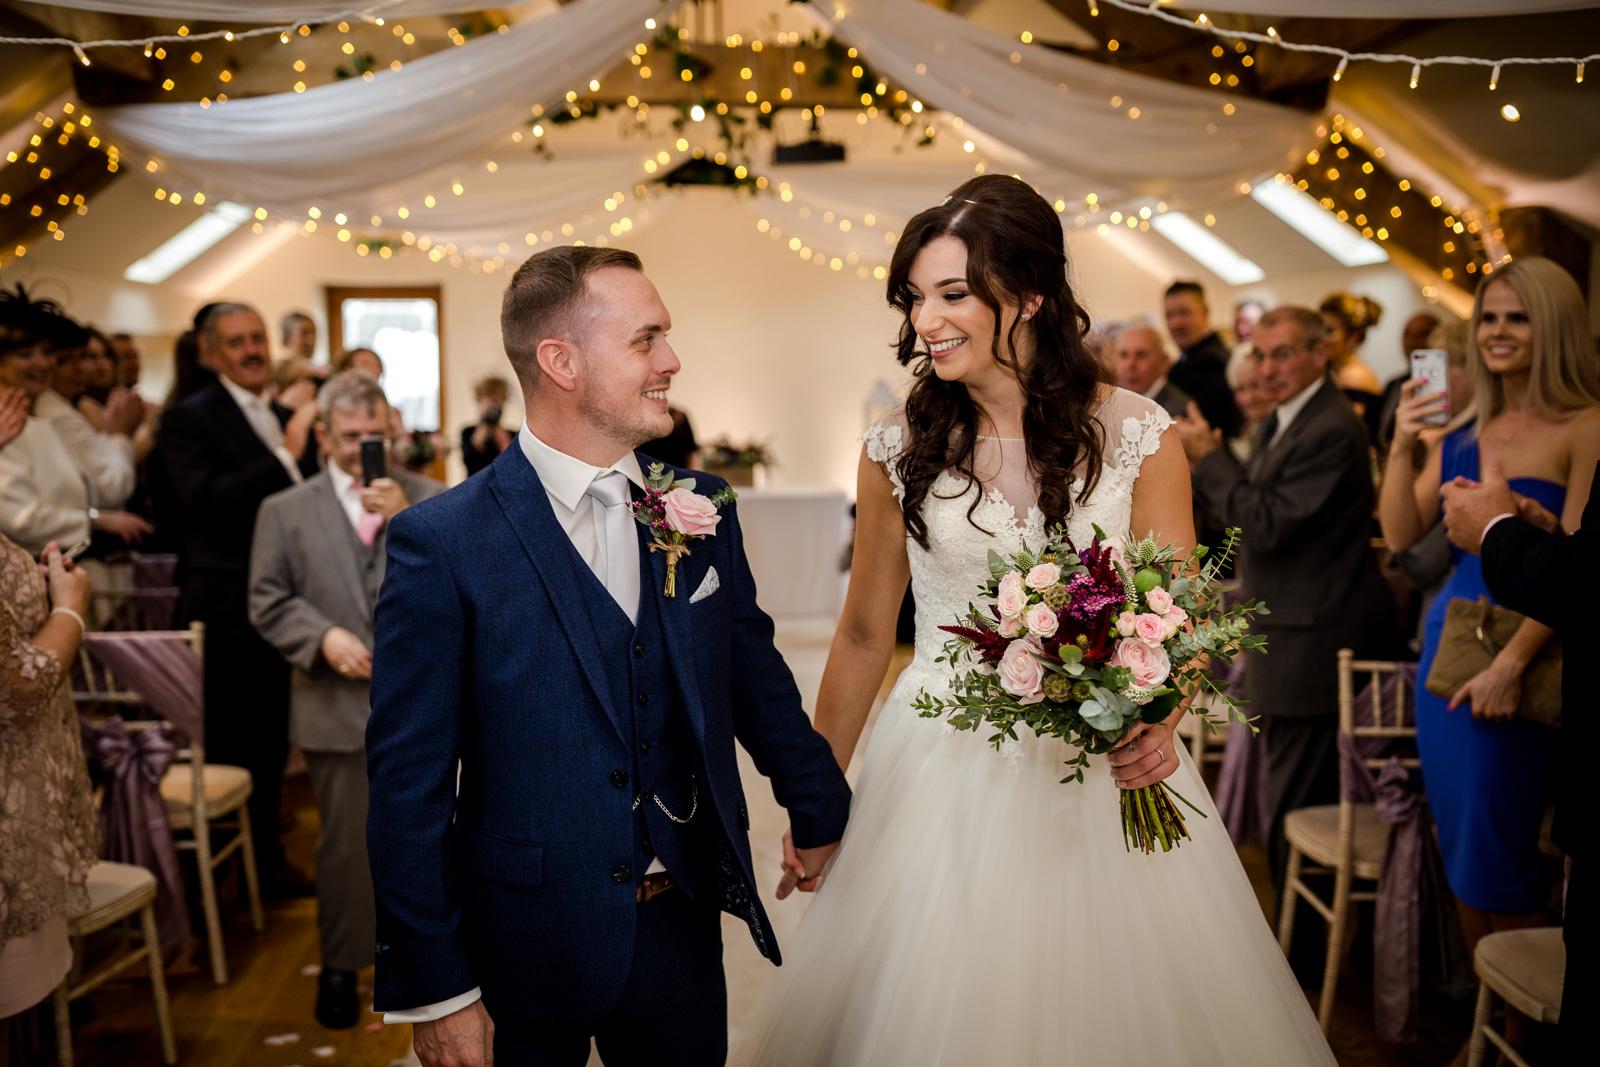 Beeston Manor Wedding Party